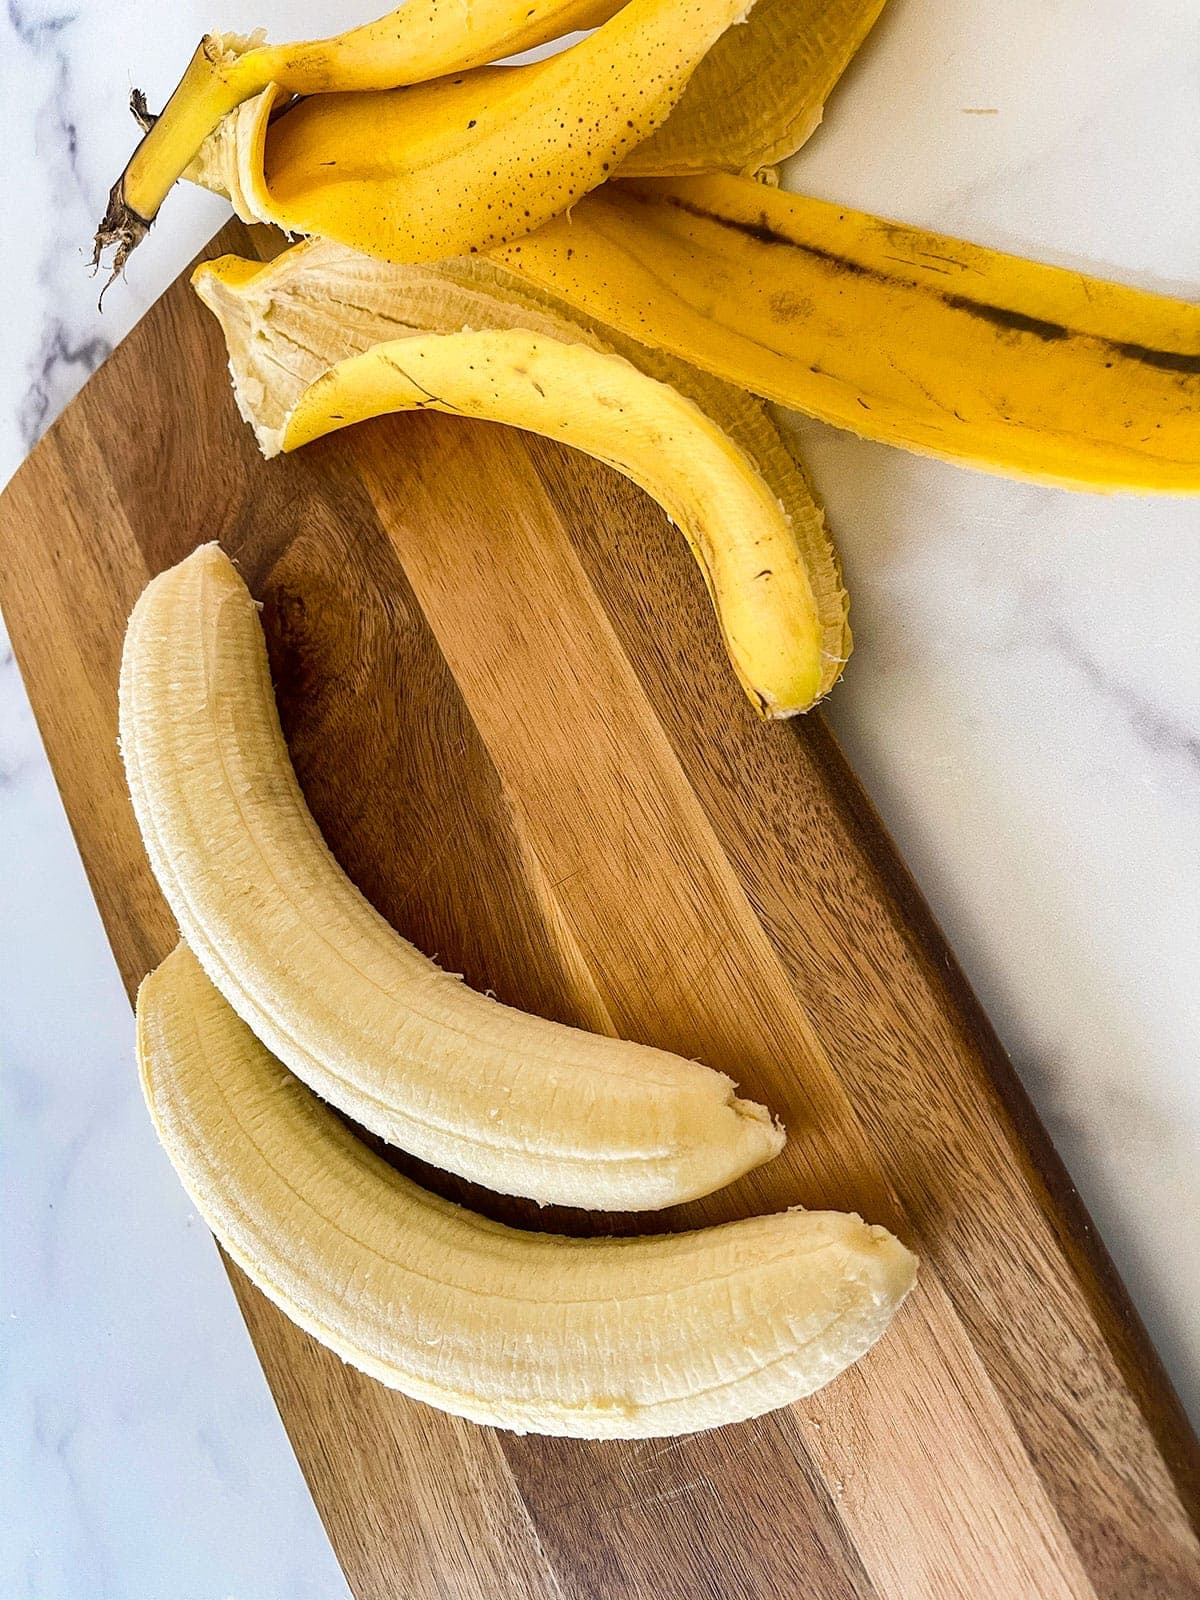 peeling bananas for banana ice cream